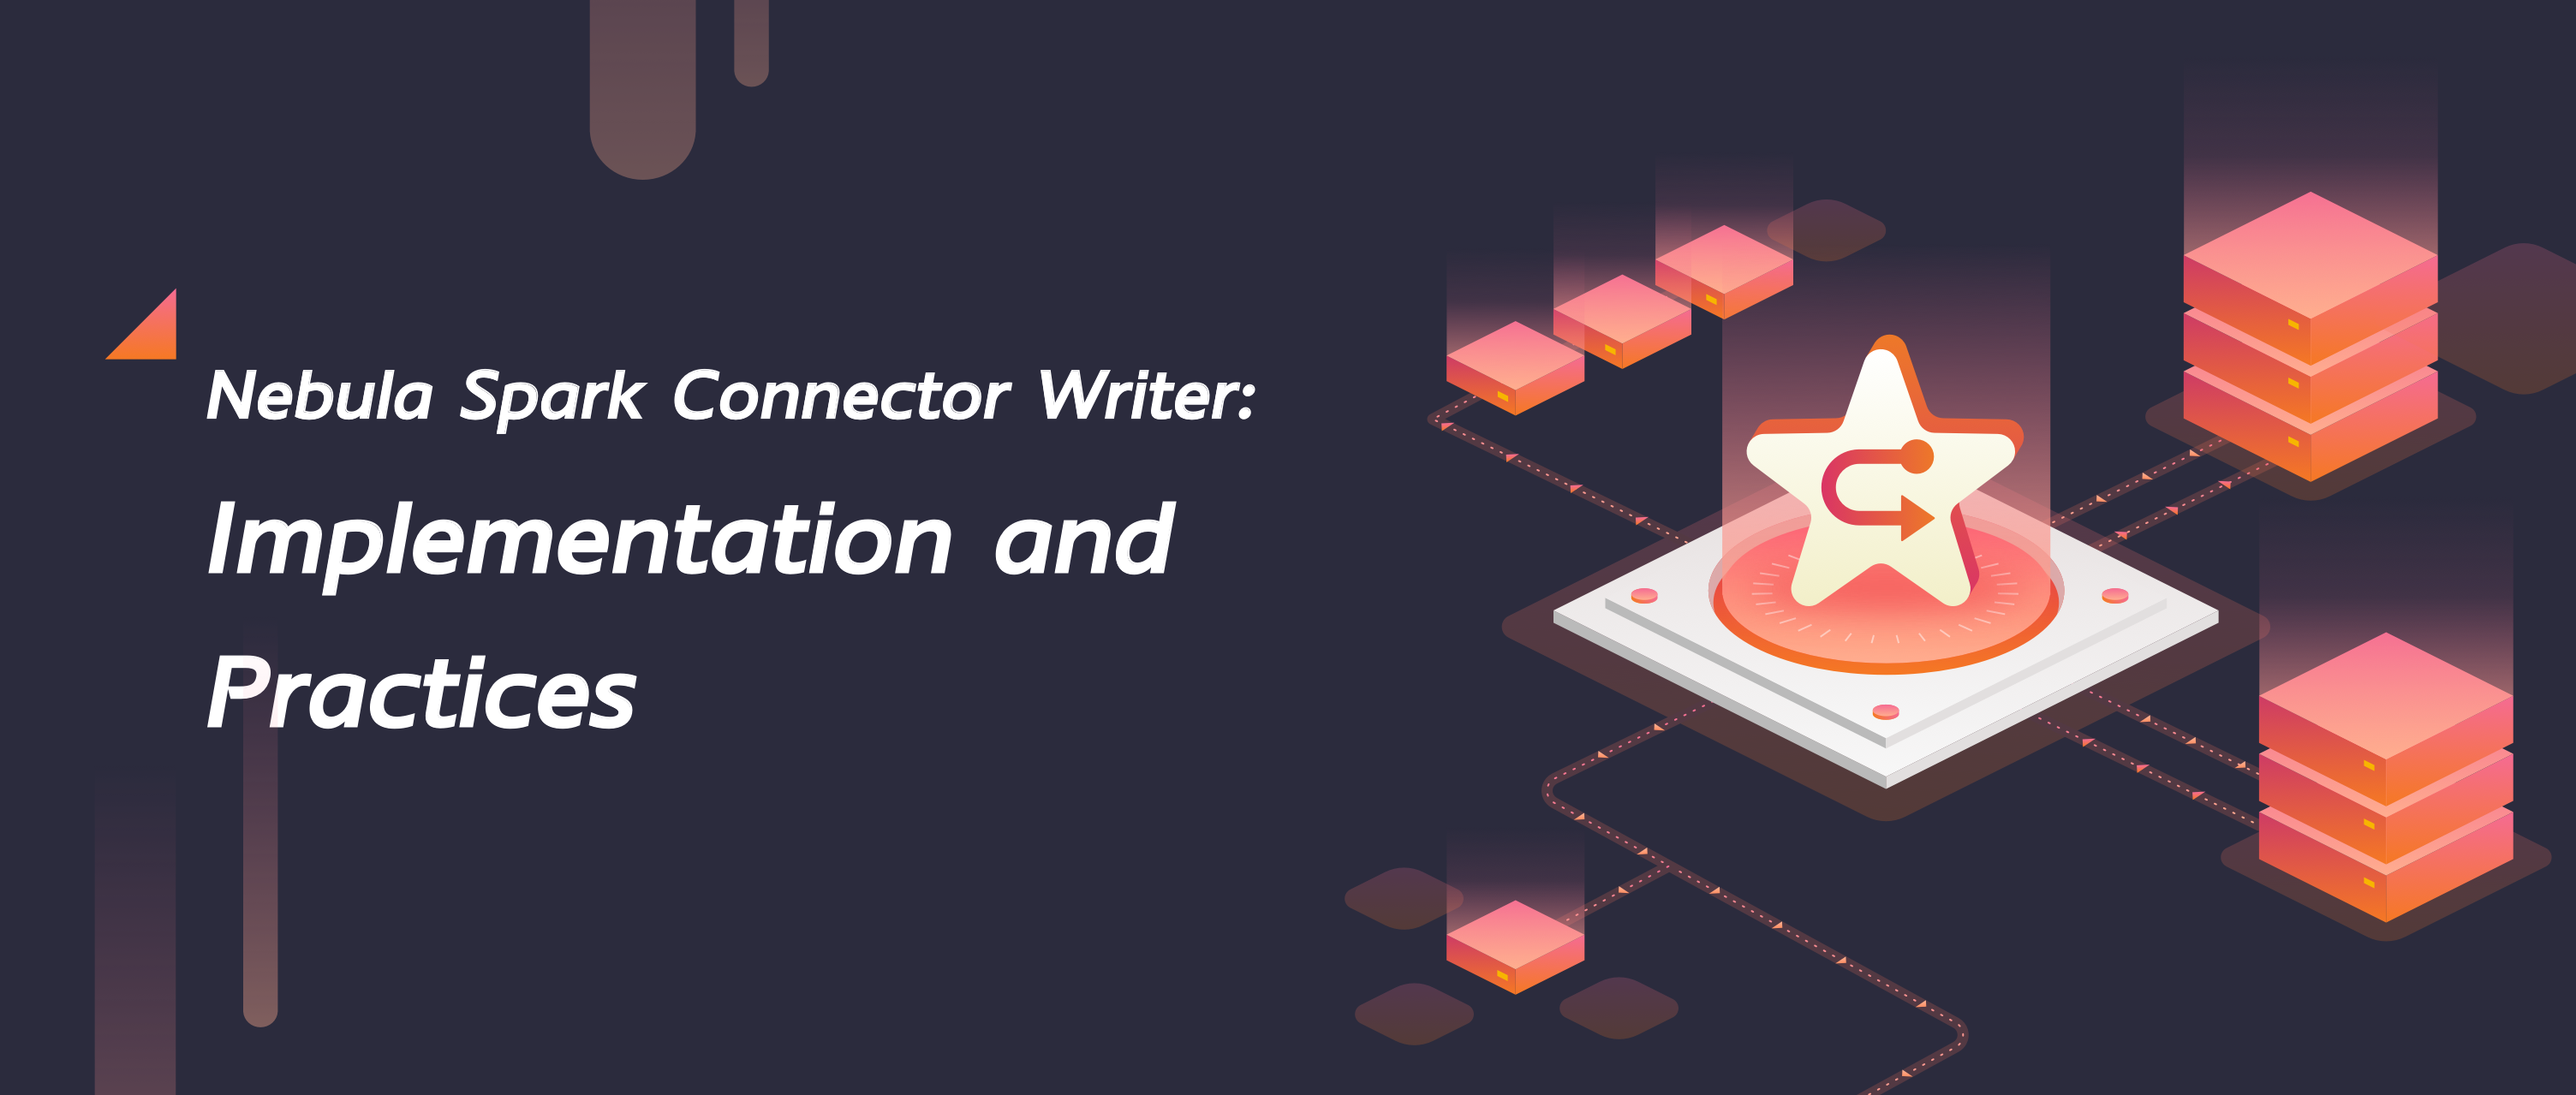 nebula-spark-connector-writer